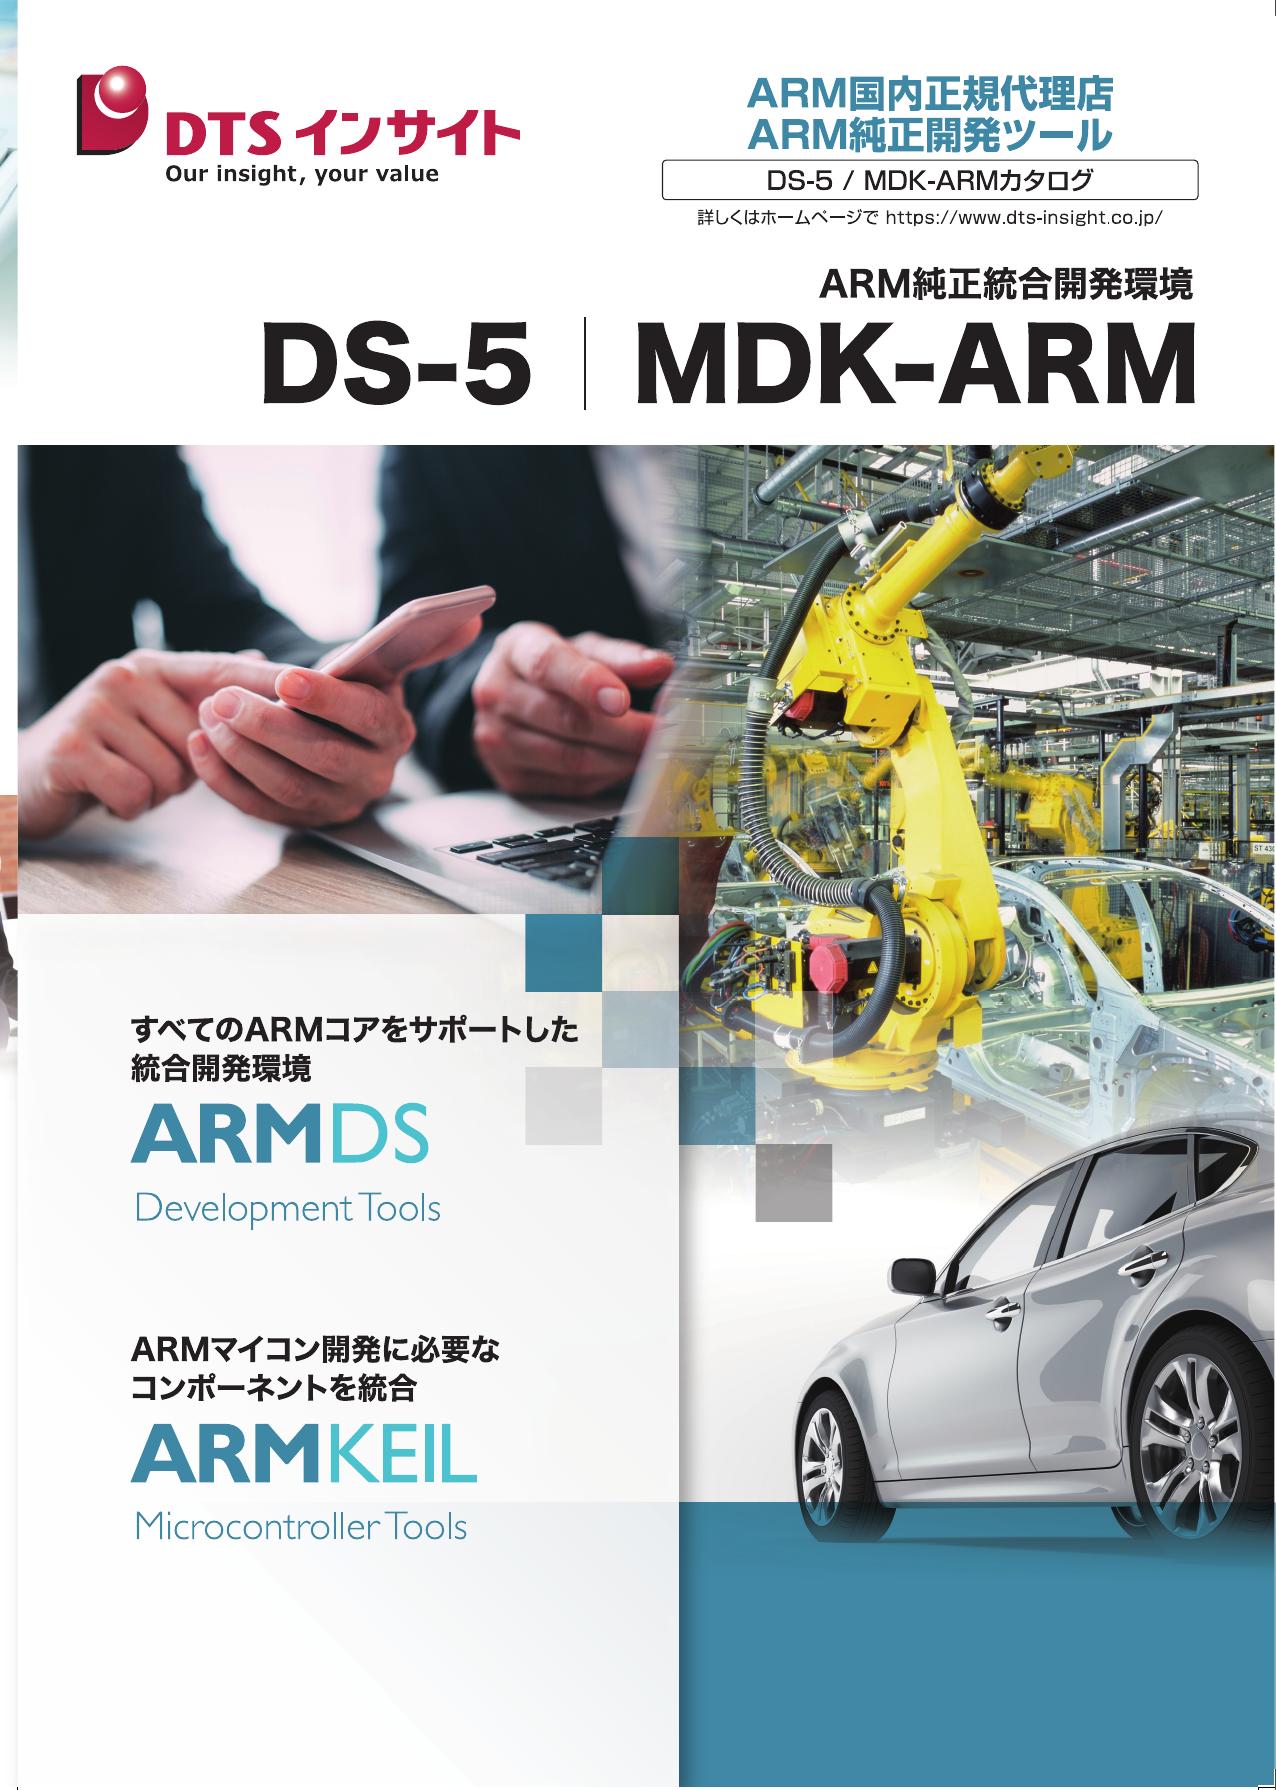 Arm®純正 DS-5/MDK-ARM 製品カタログ